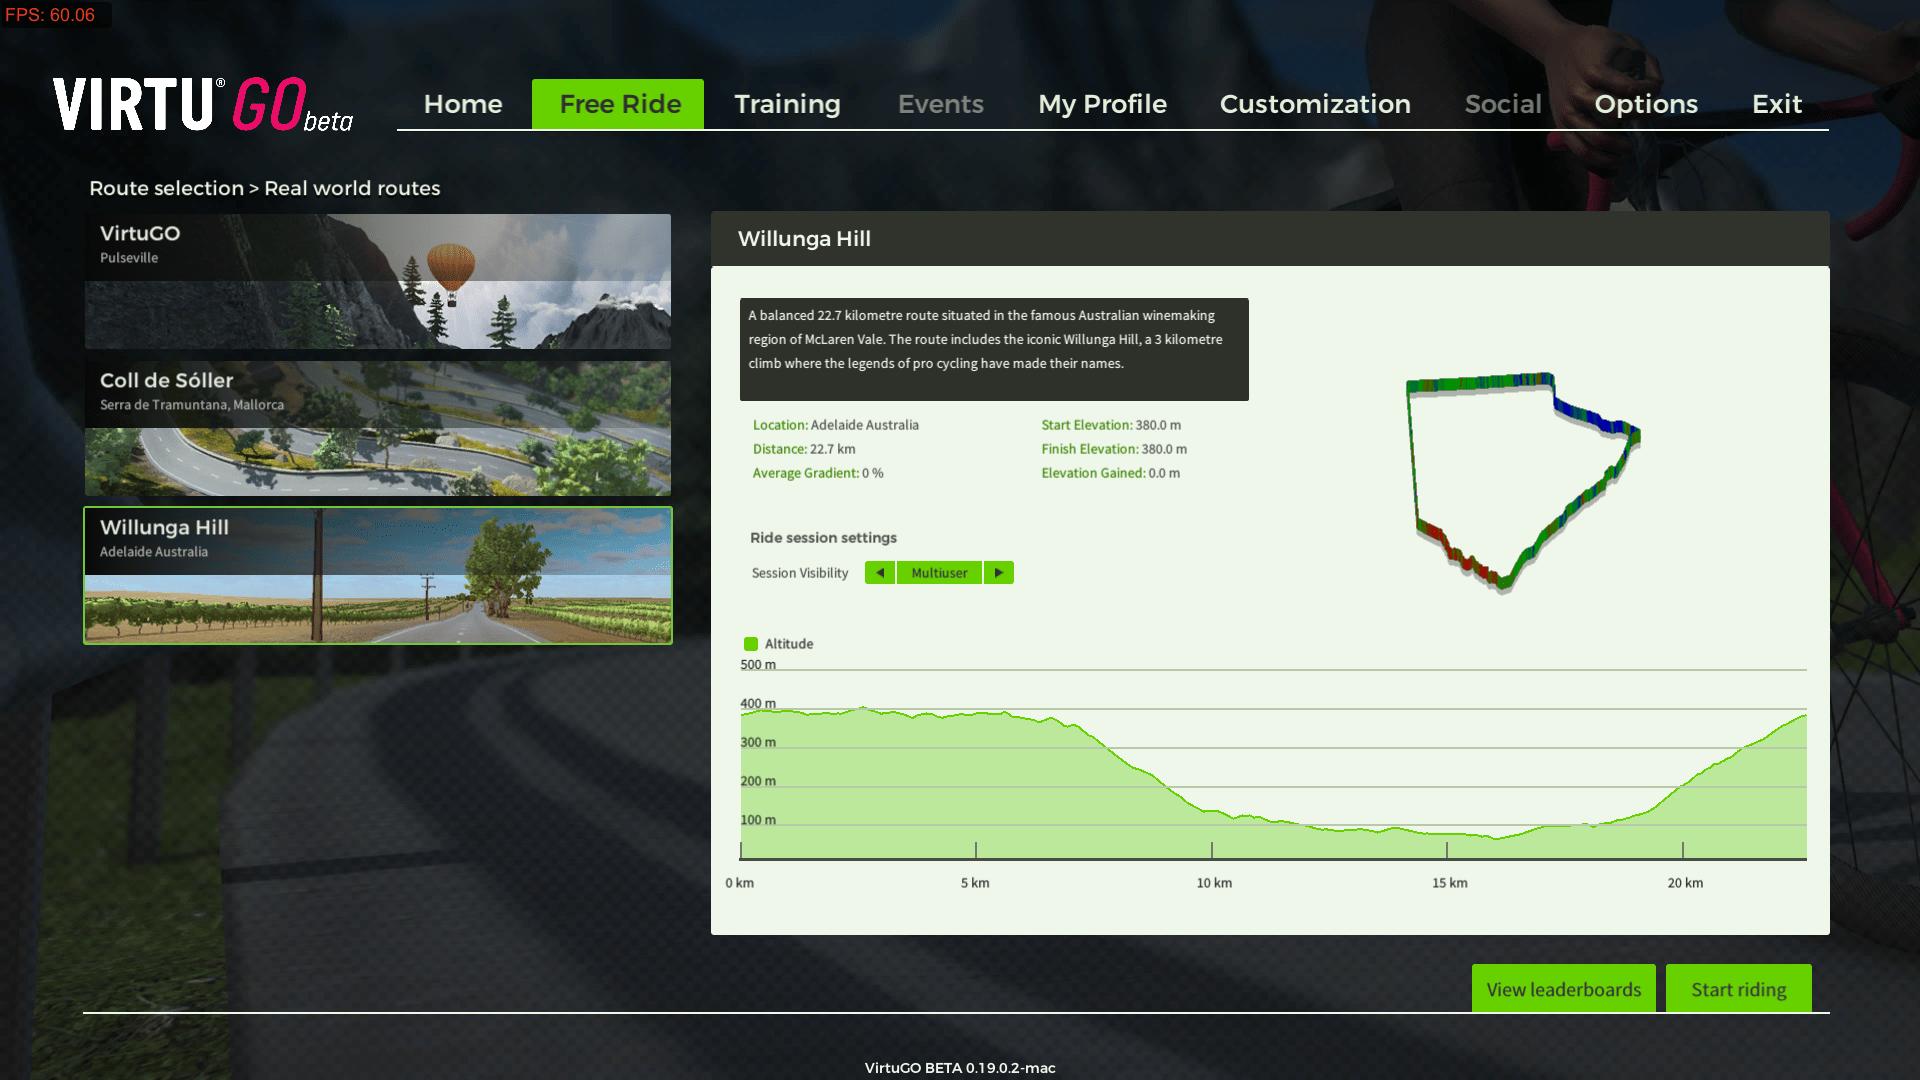 VirtuGO Beta Free Ride Route 3 - Willunga Hill (22.7 Km)